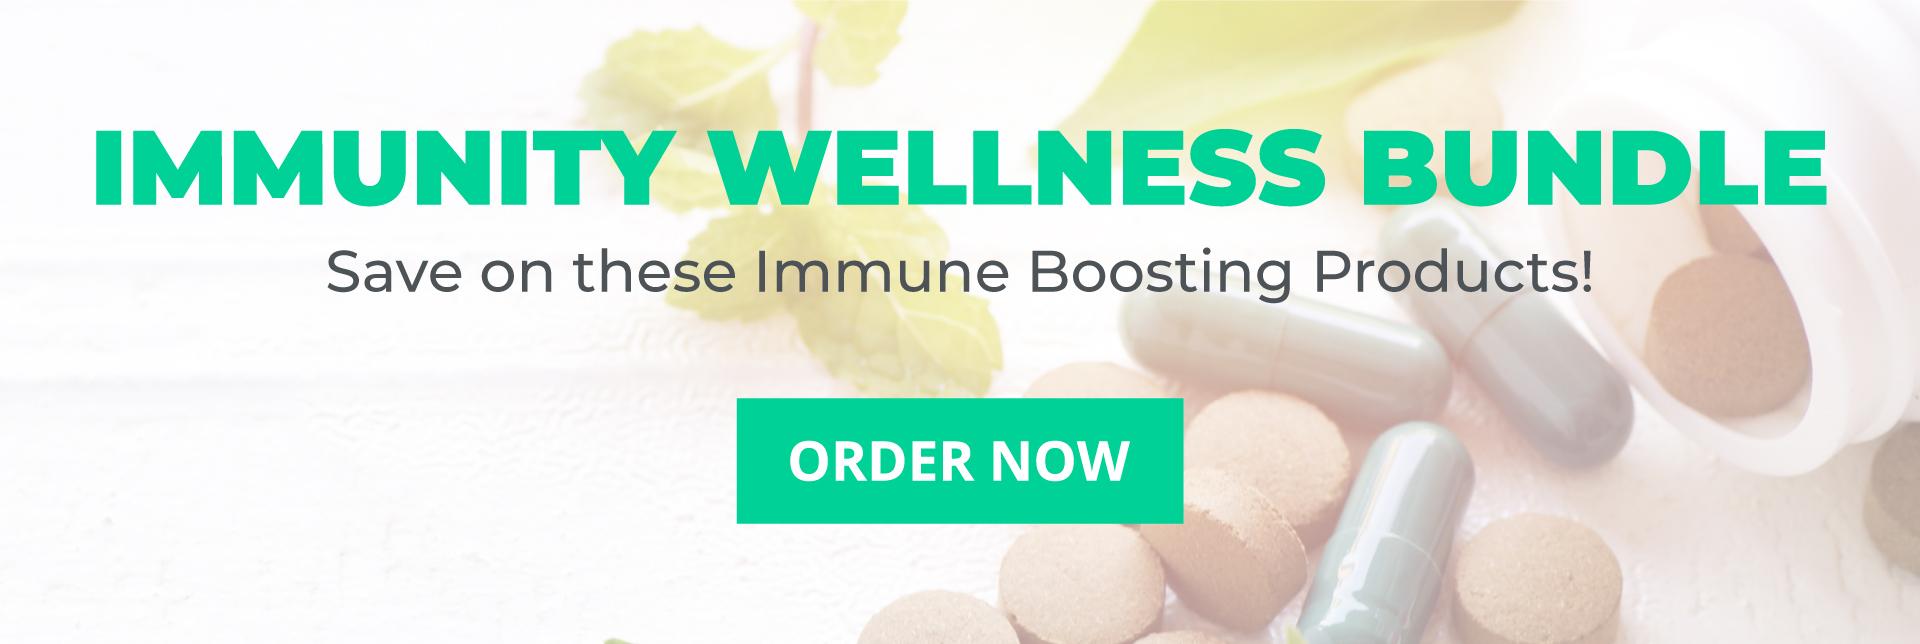 Ordering Immunity Wellness Bundle